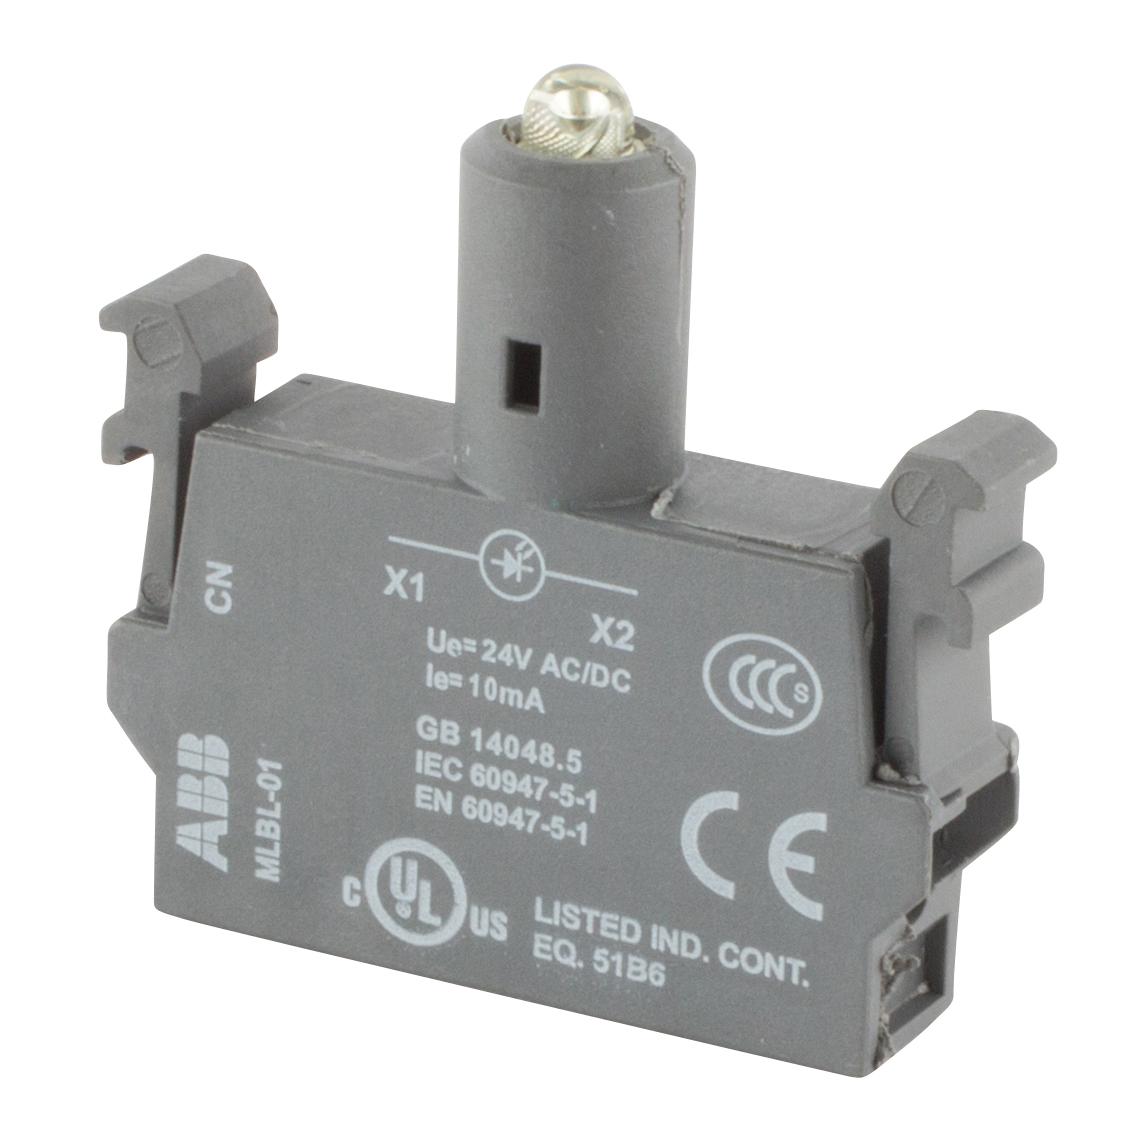 ABB MLBL-01Y Modular Lamp Block